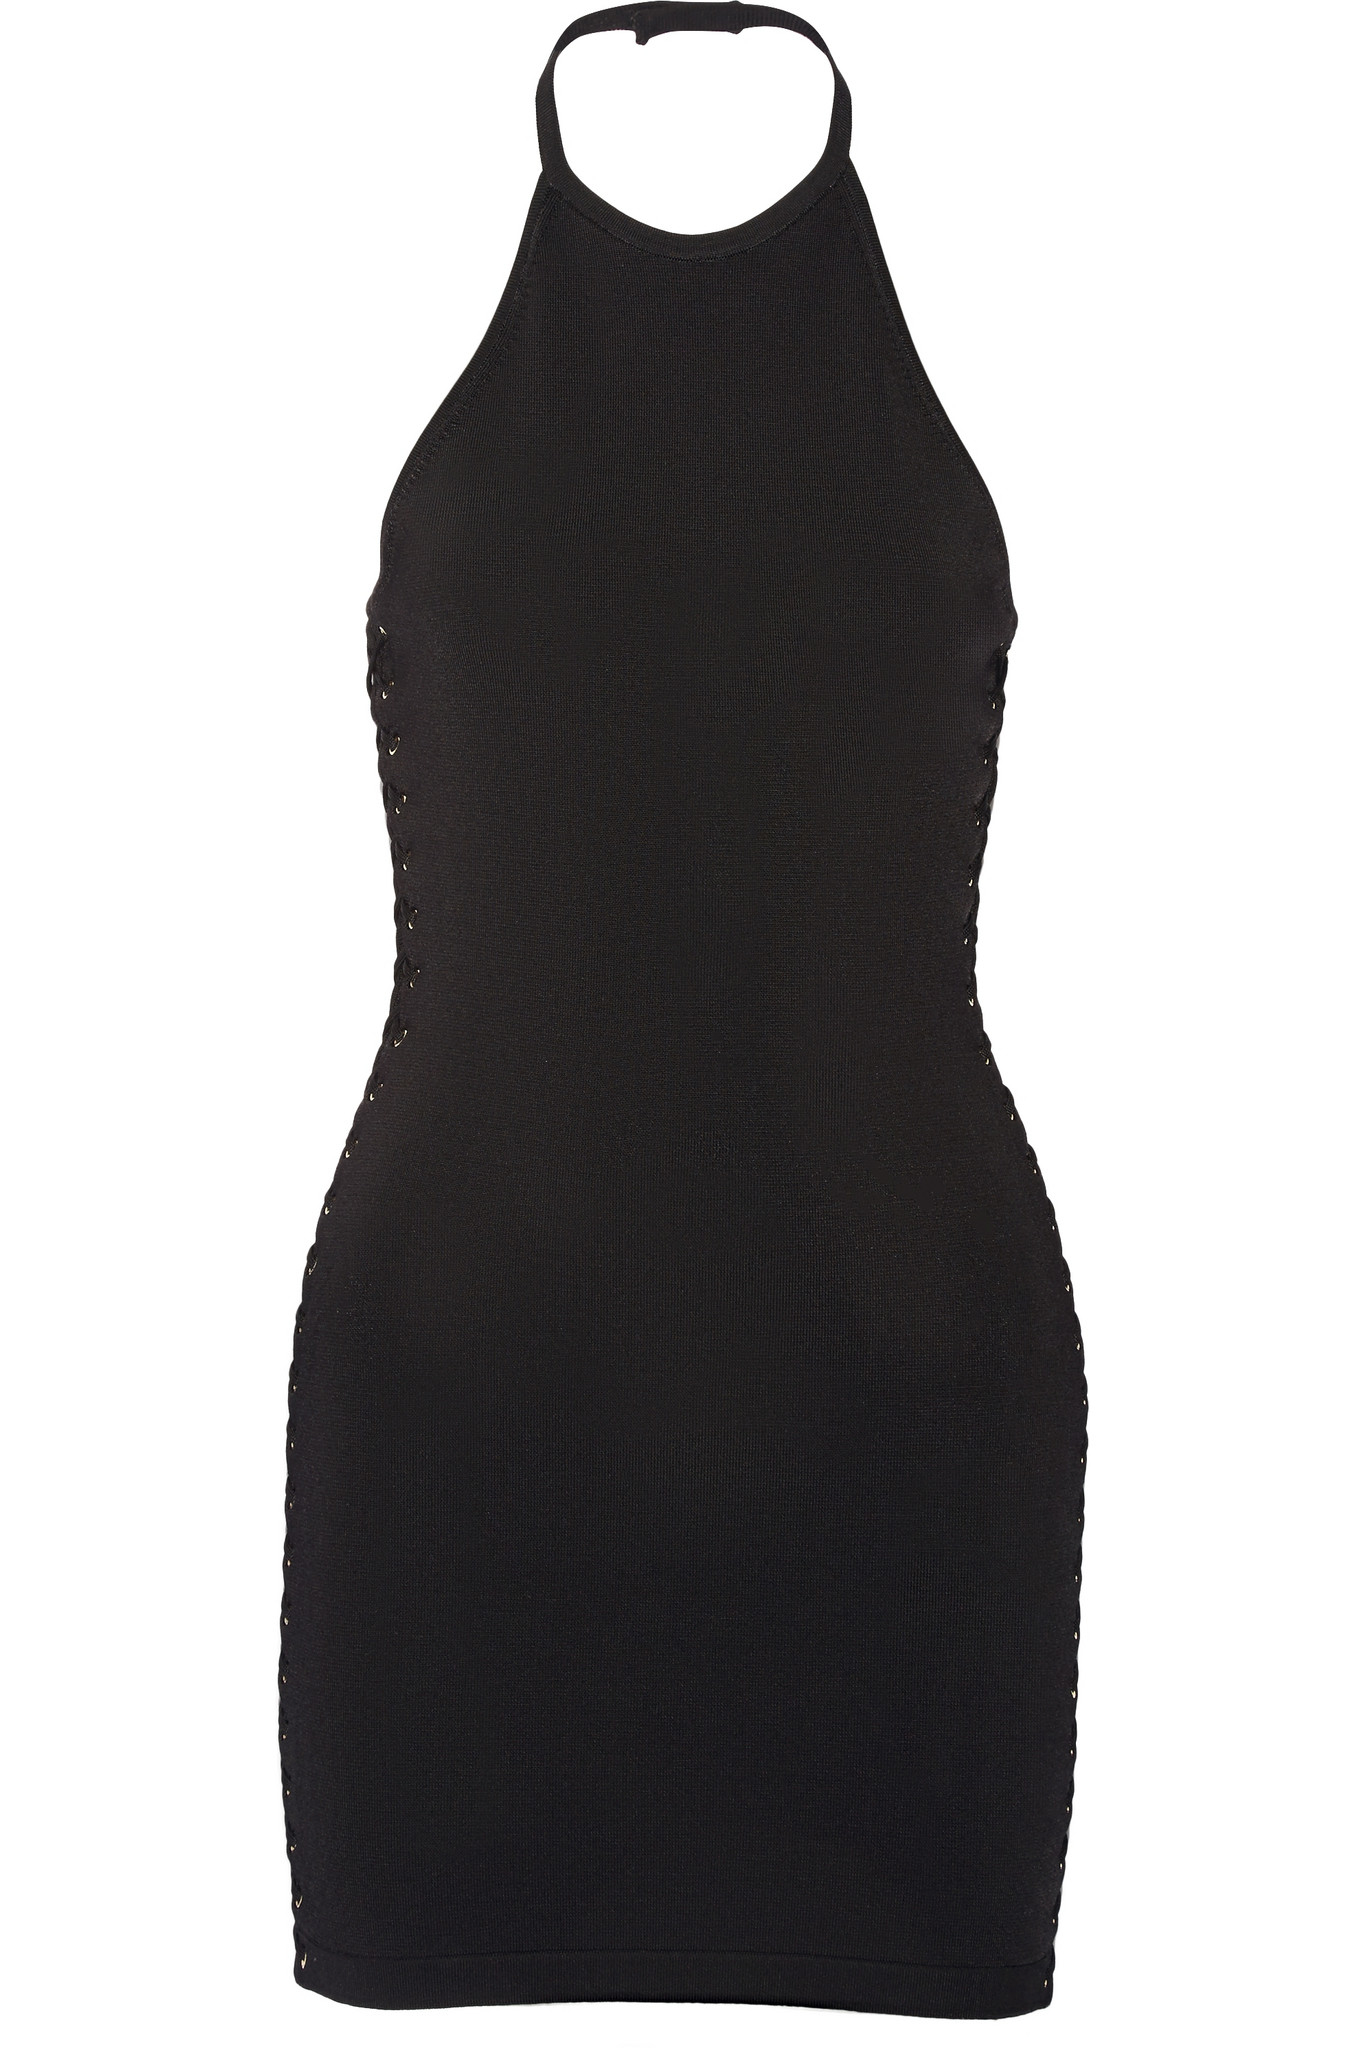 ea363485251a Lyst - Balmain Lace-up Stretch-knit Mini Dress in Black